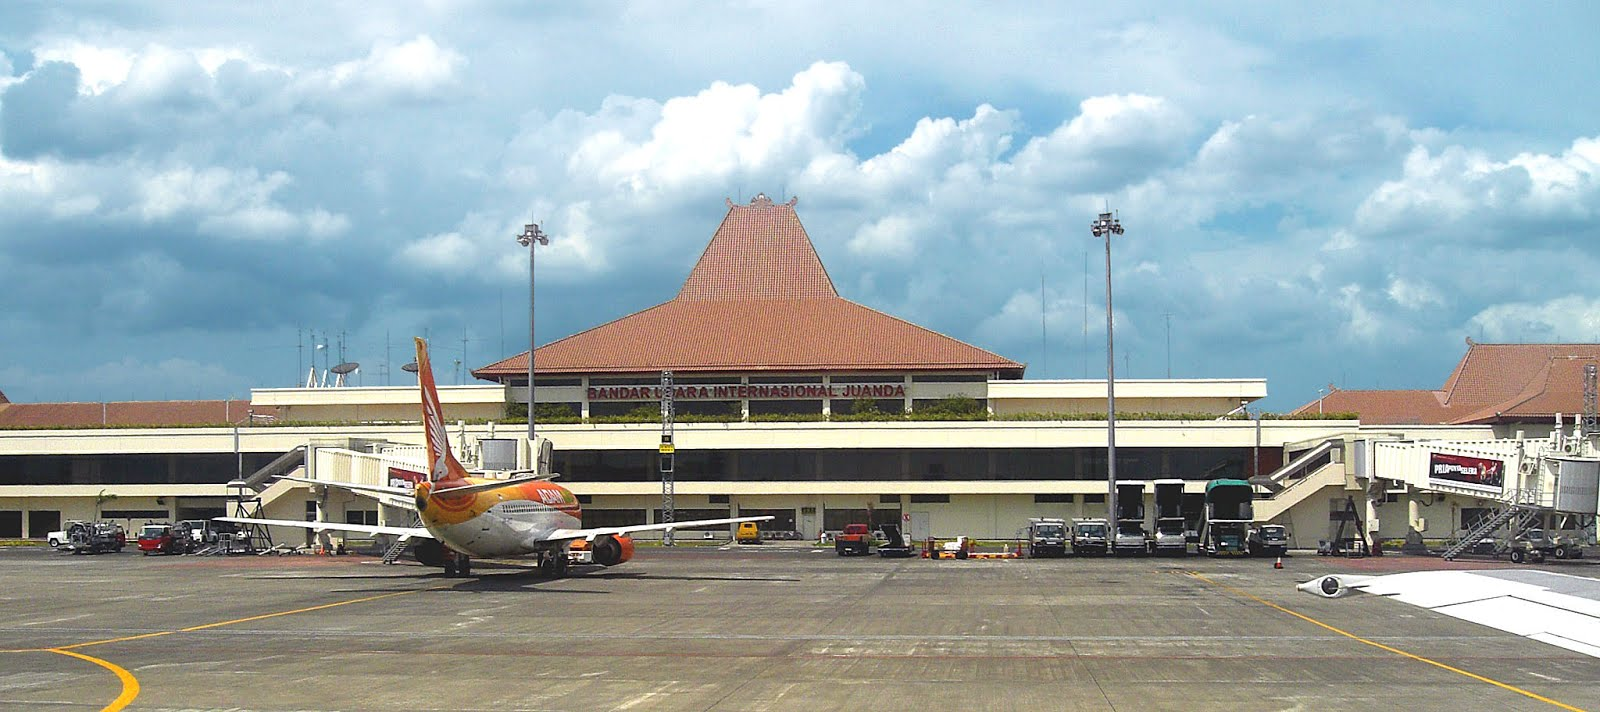 Cek Harga Tiket Pesawat Makassar Surabaya Disini Pesan Tiket